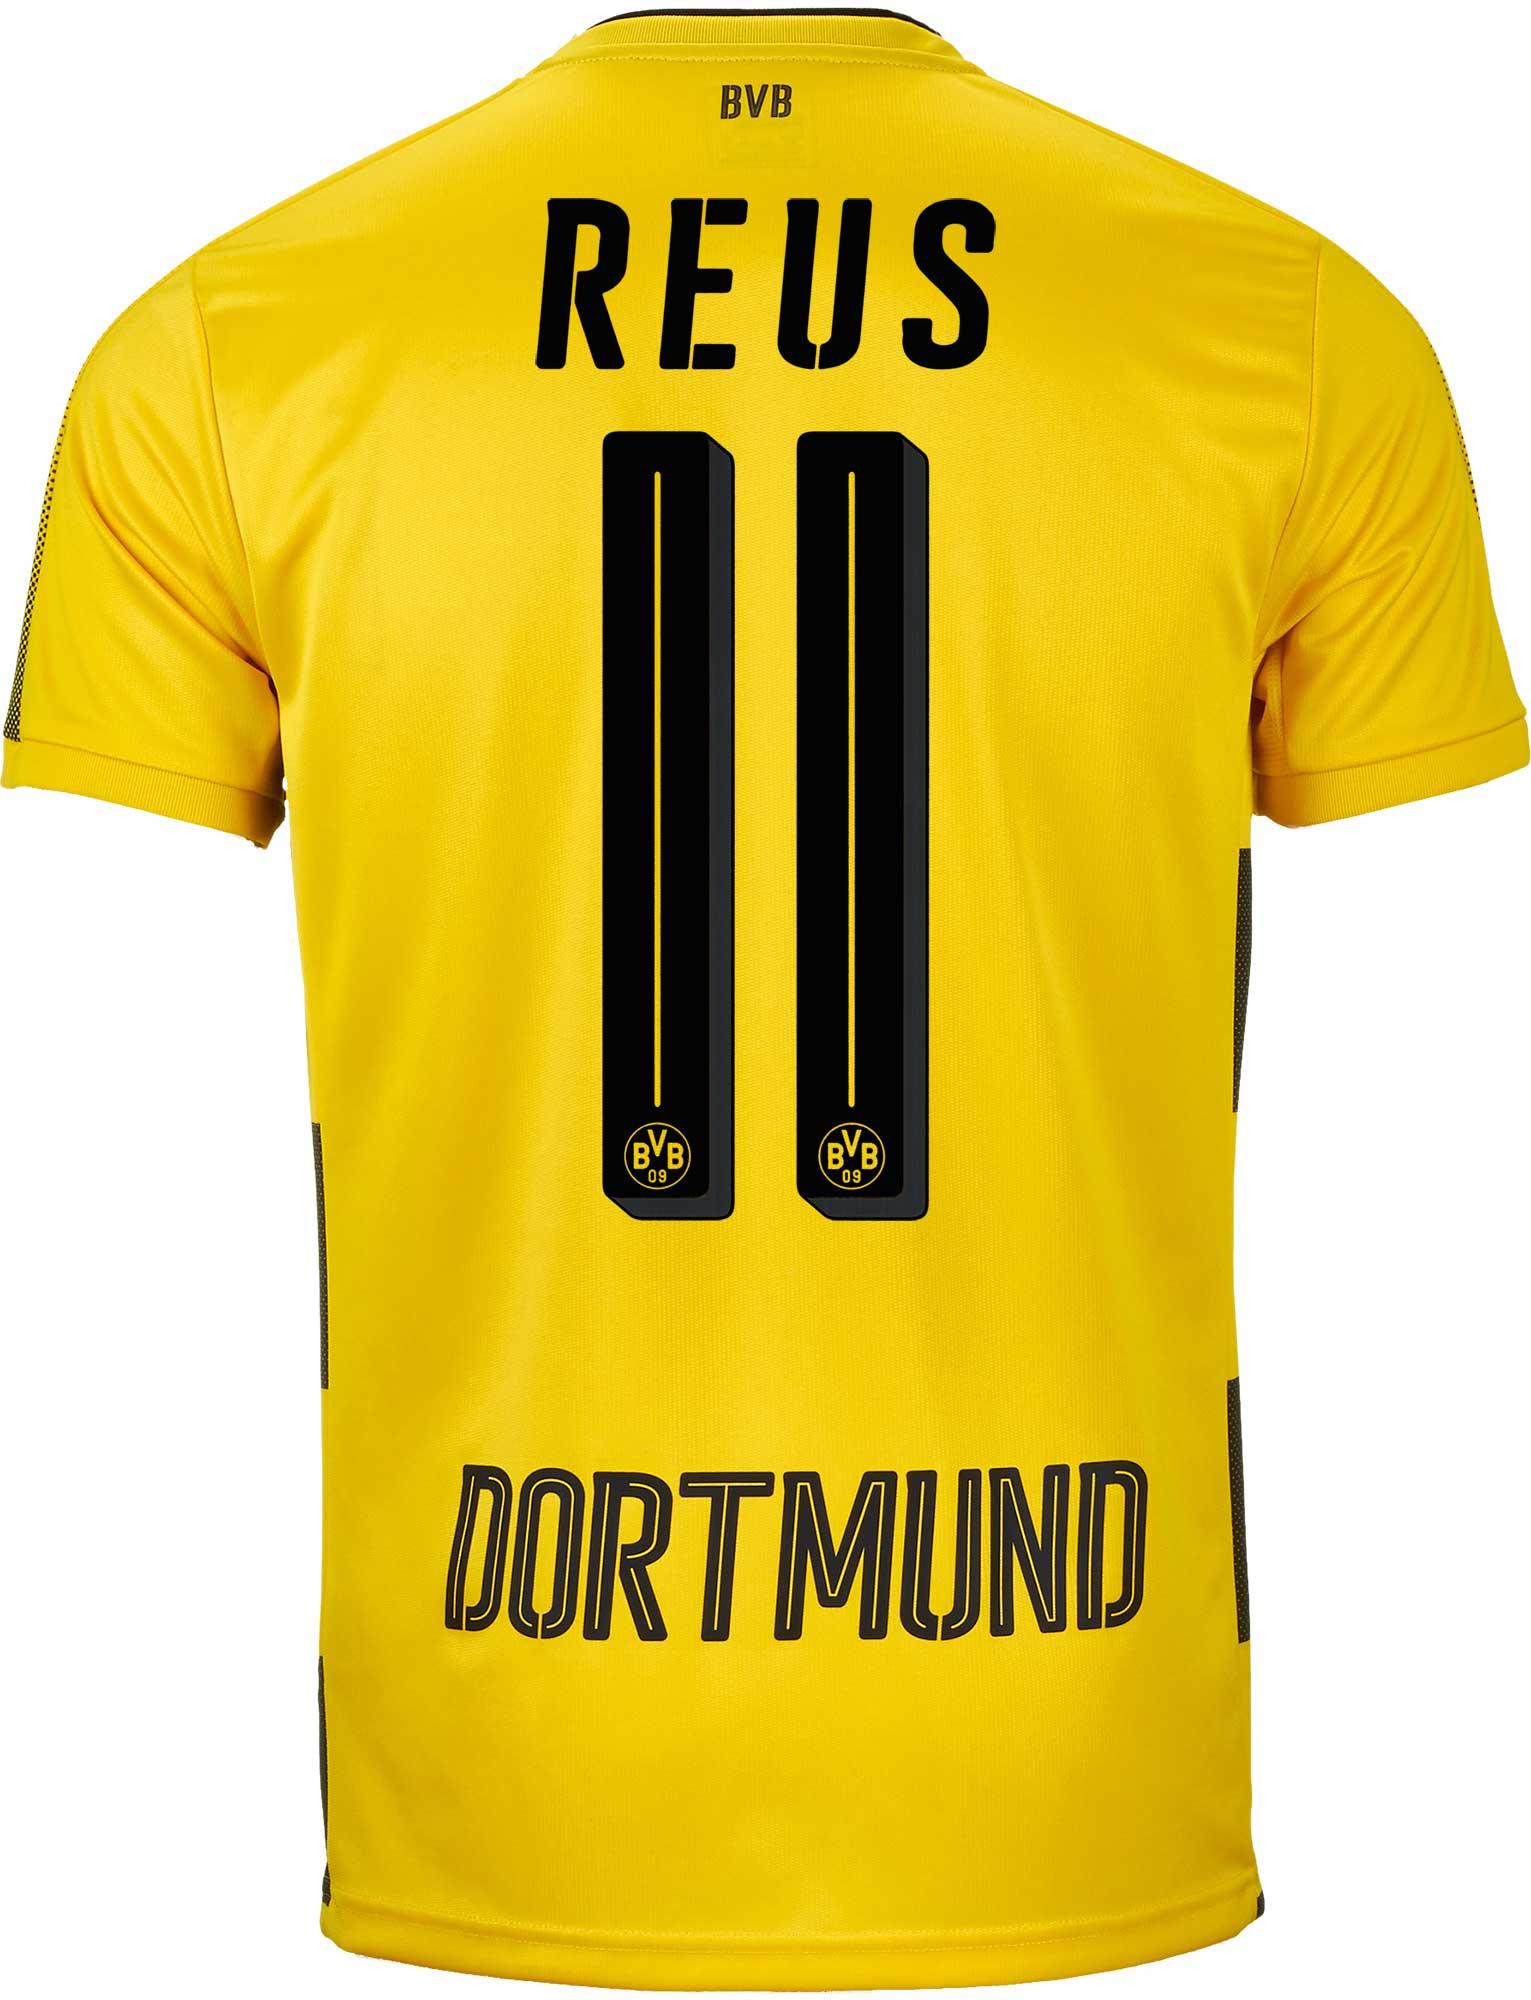 competitive price 86a17 a6568 Puma Marco Reus Borussia Dortmund Home Jersey 2017-18